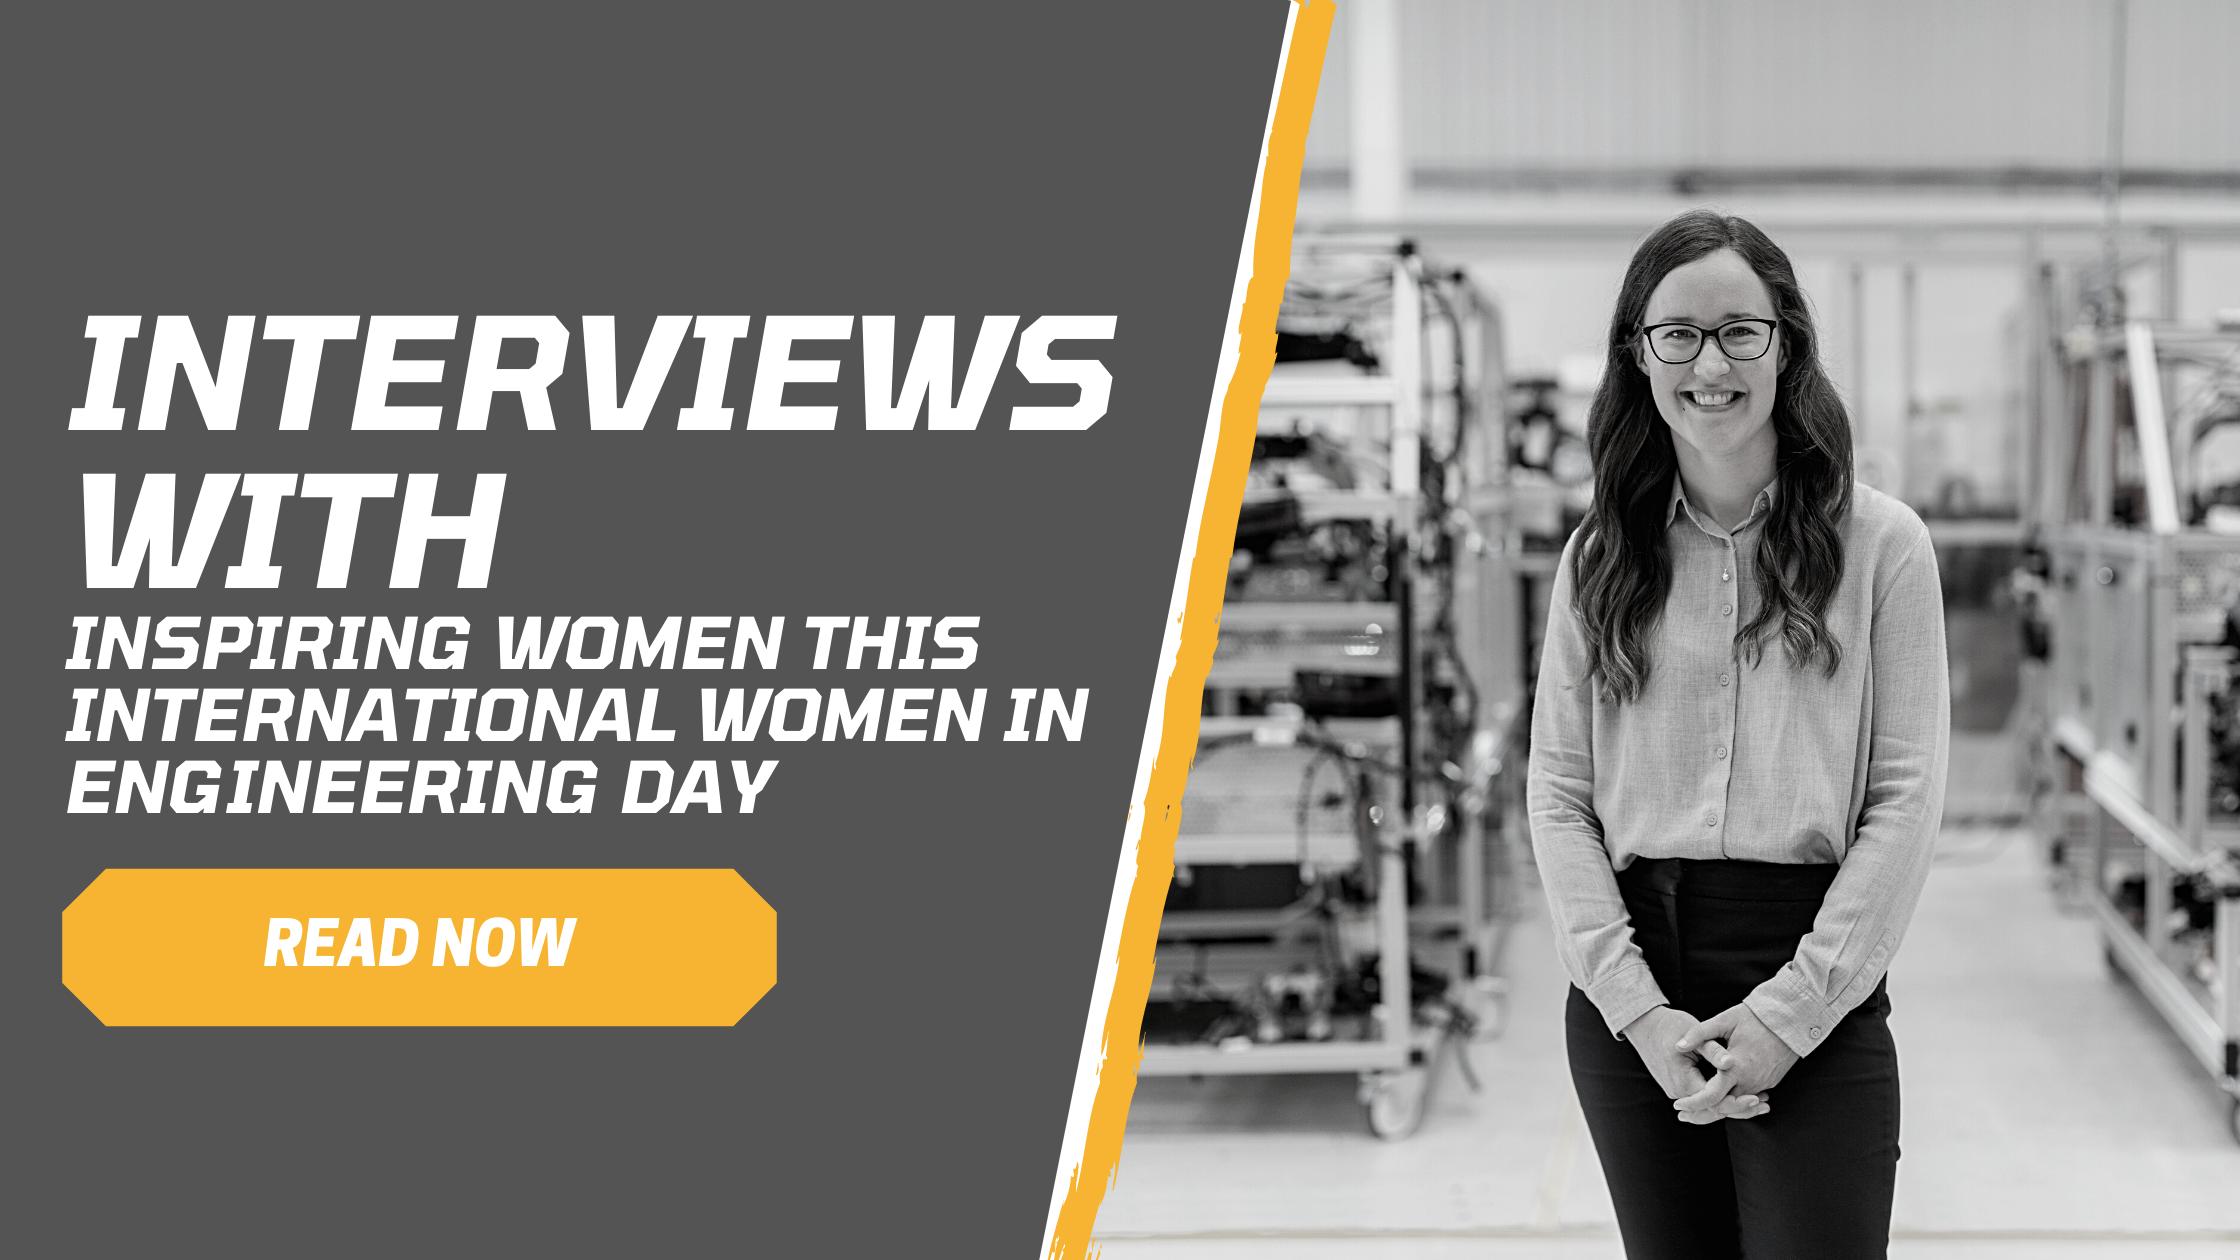 Interviews with inspiring women this international women in engineering day